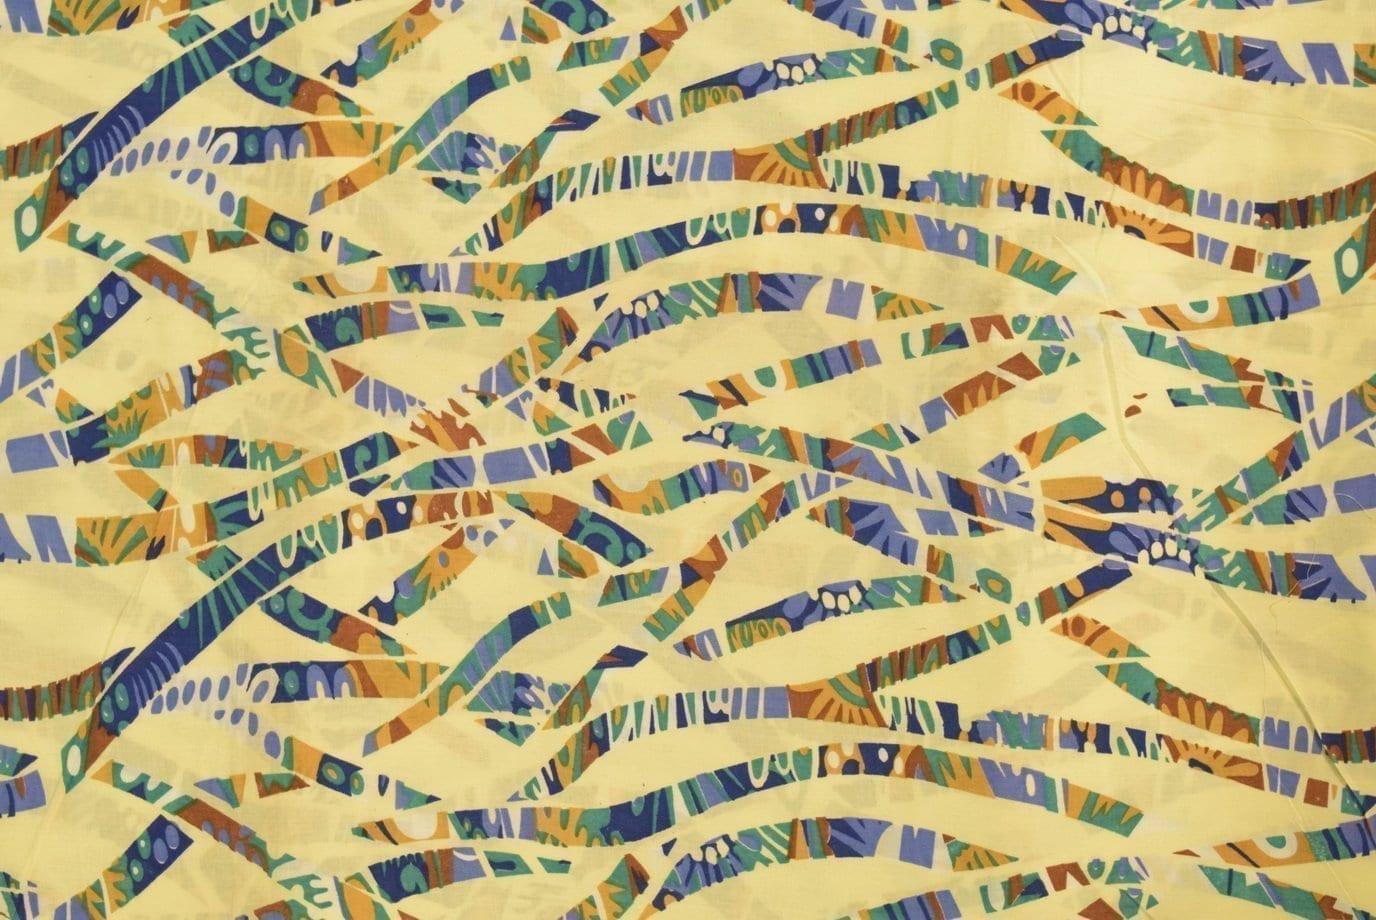 100% PURE Soft COTTON PRINTED fabric PC207 2